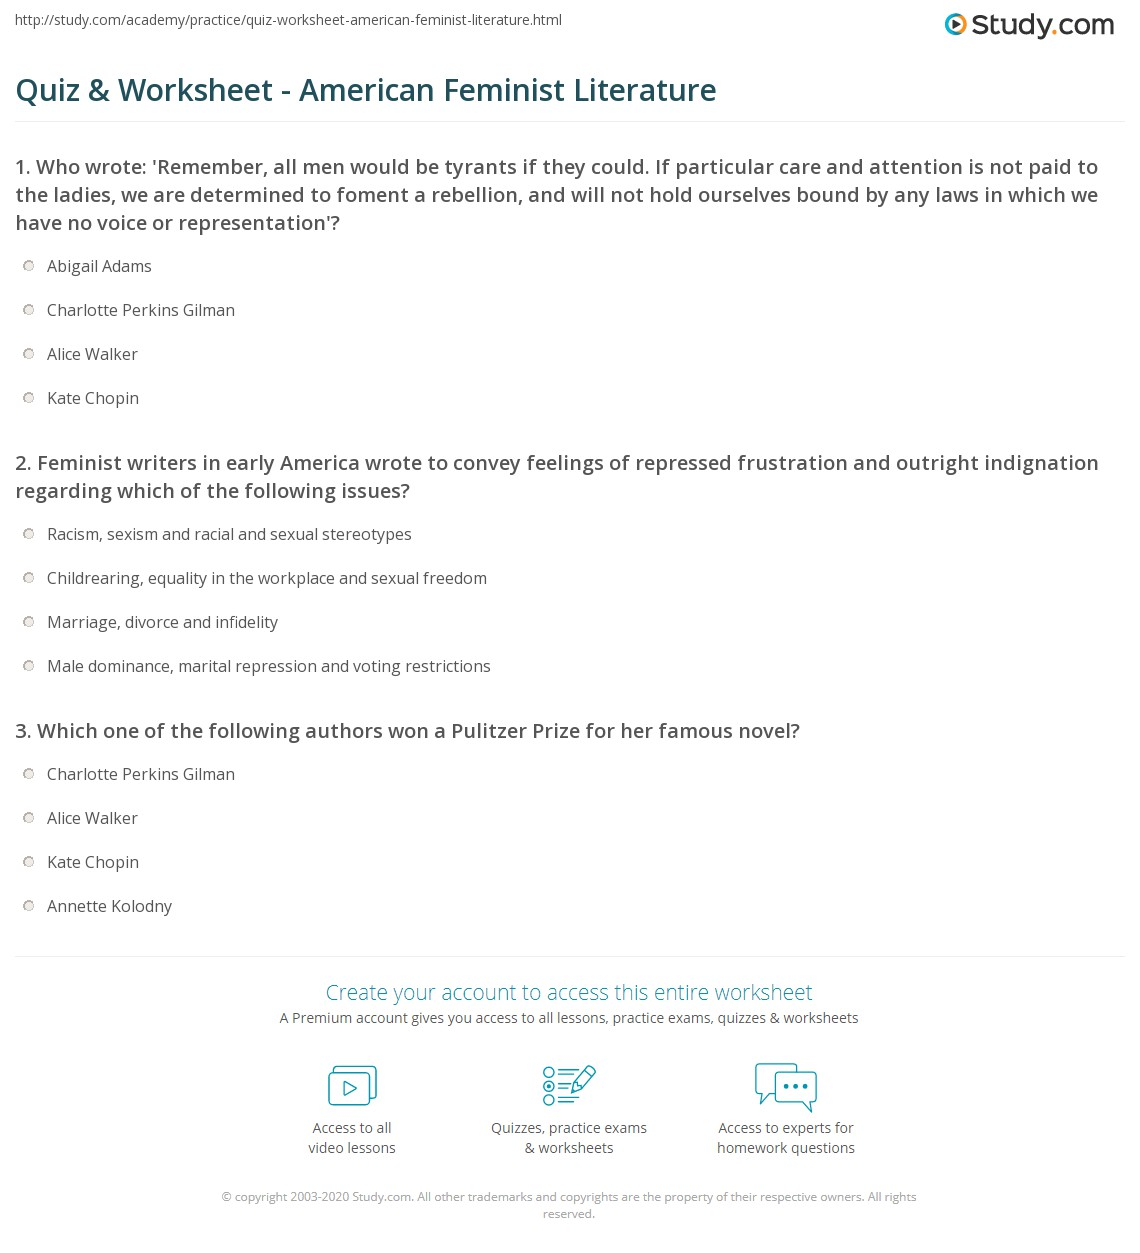 quiz worksheet american feminist literature com print american feminist literature definition characteristics worksheet